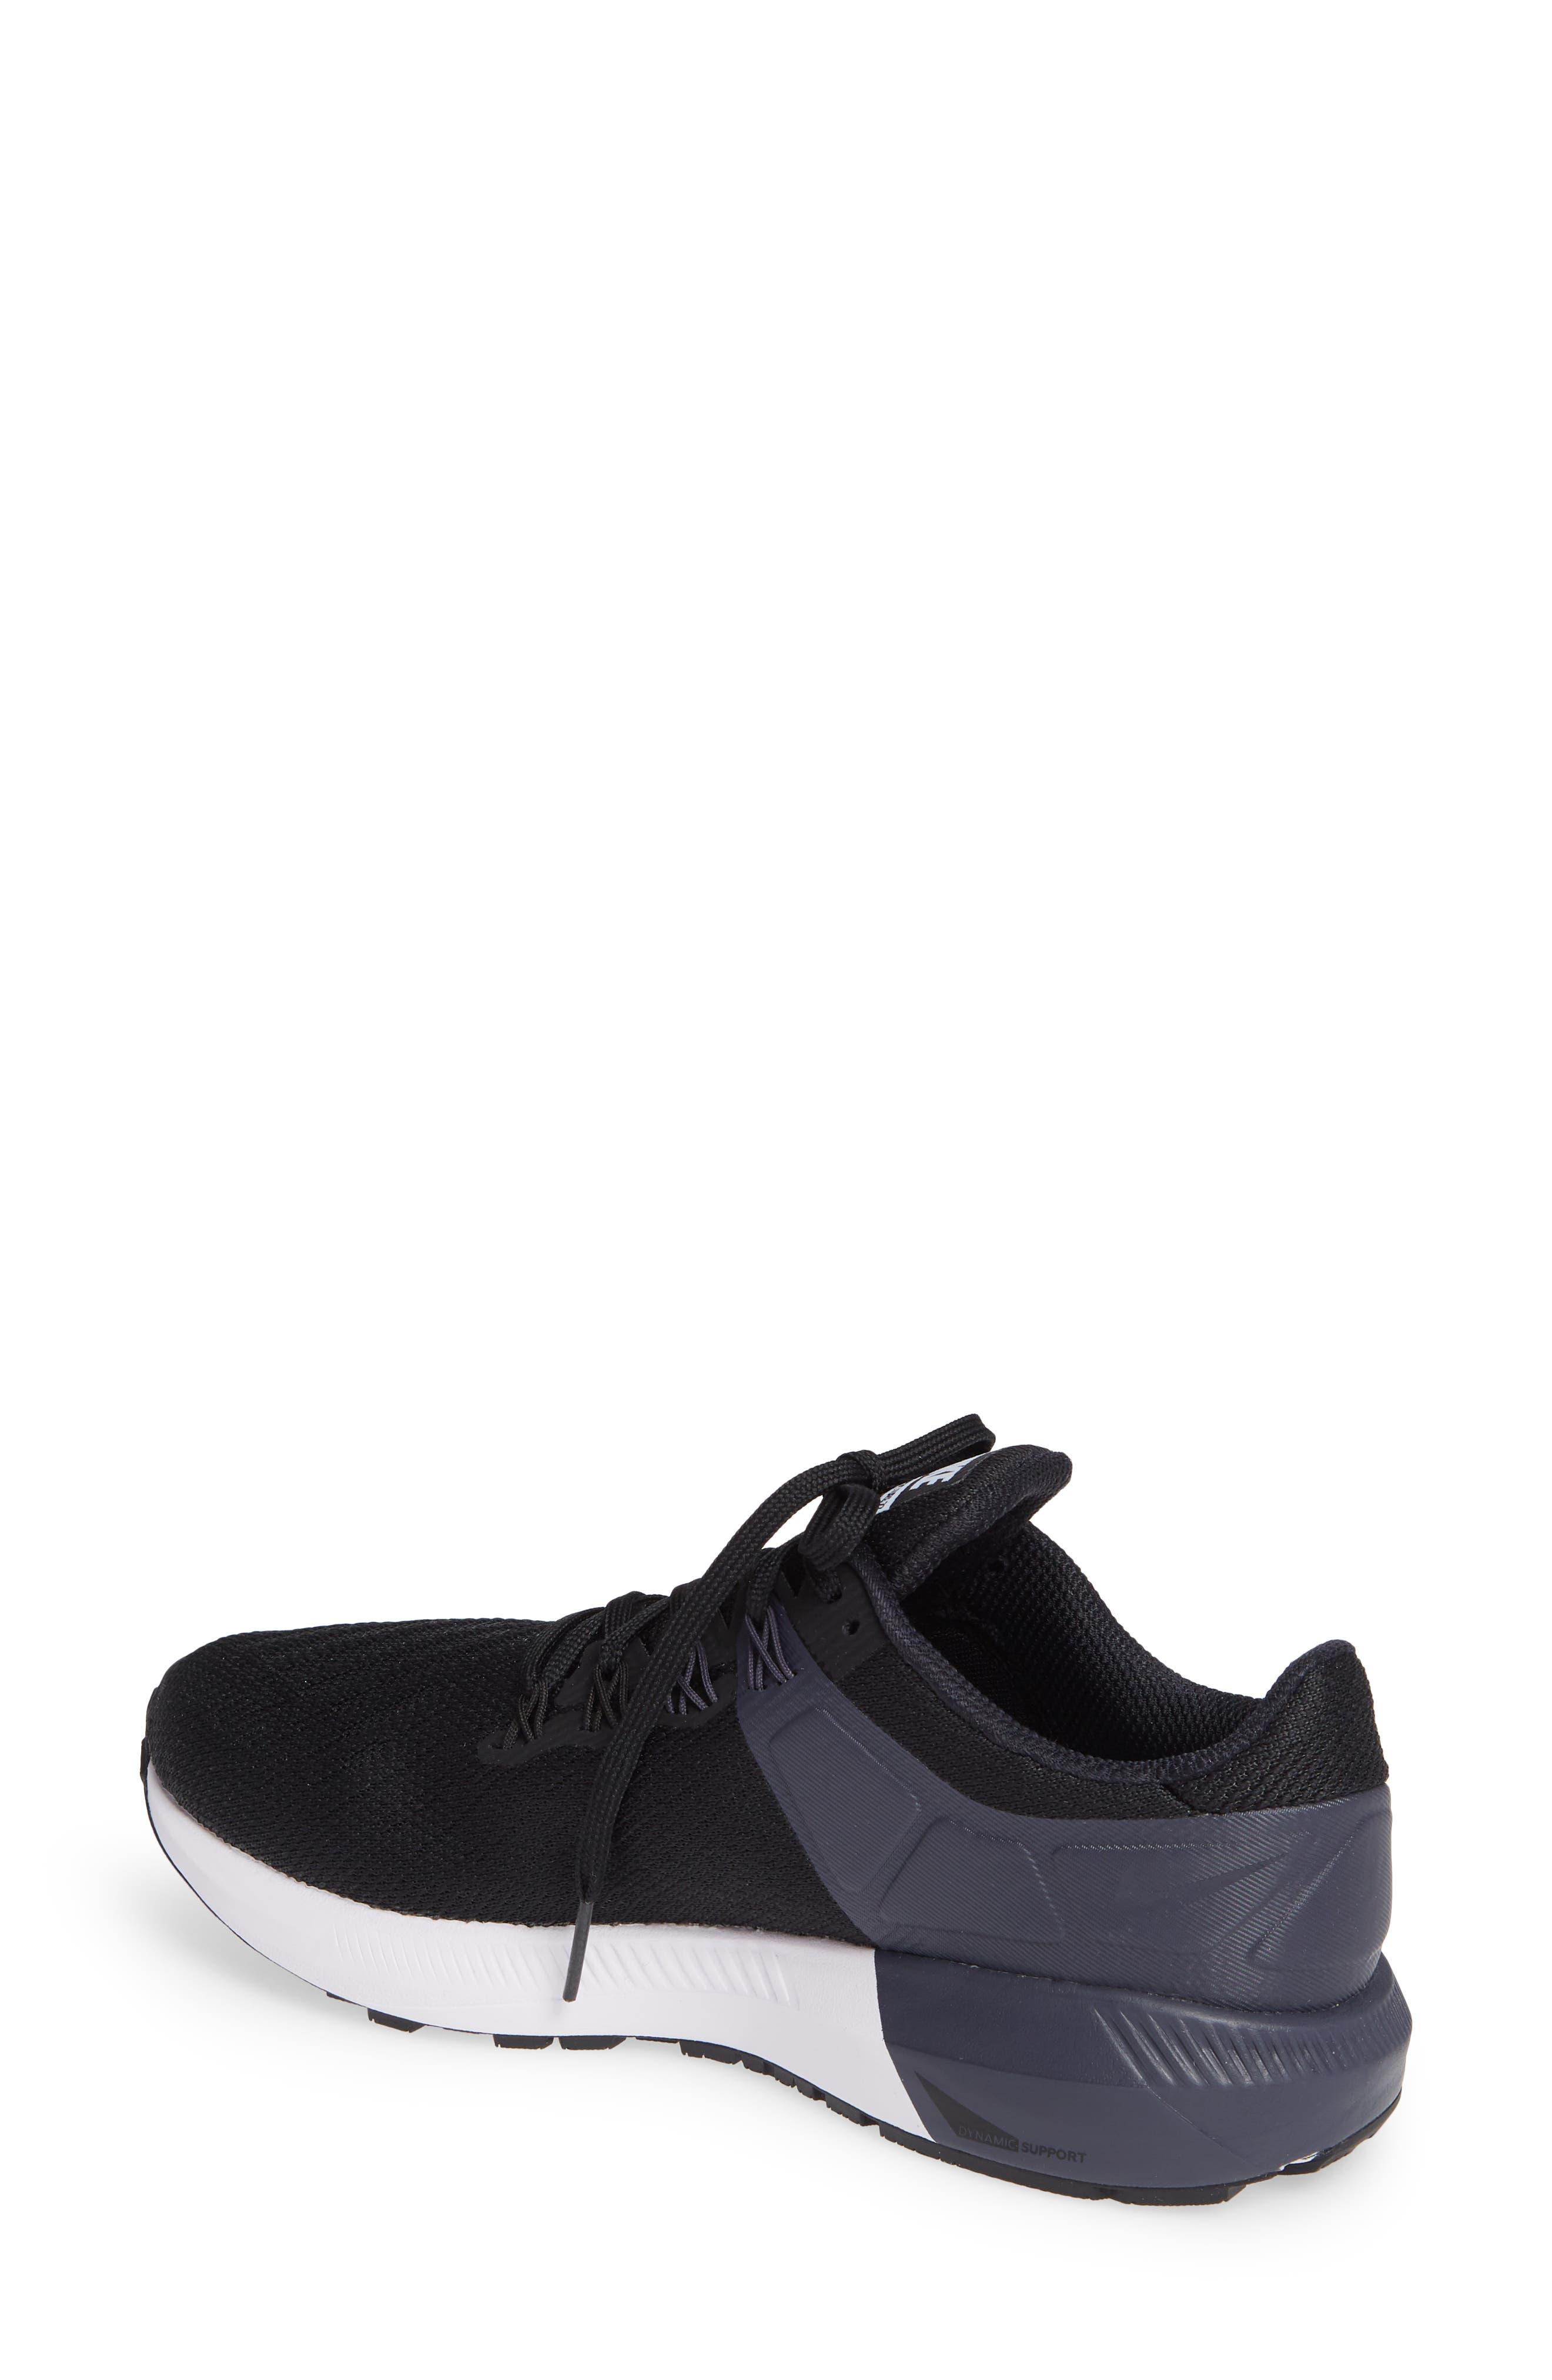 NIKE, Air Zoom Structure 22 Sneaker, Alternate thumbnail 2, color, BLACK/ WHITE-GRIDIRON